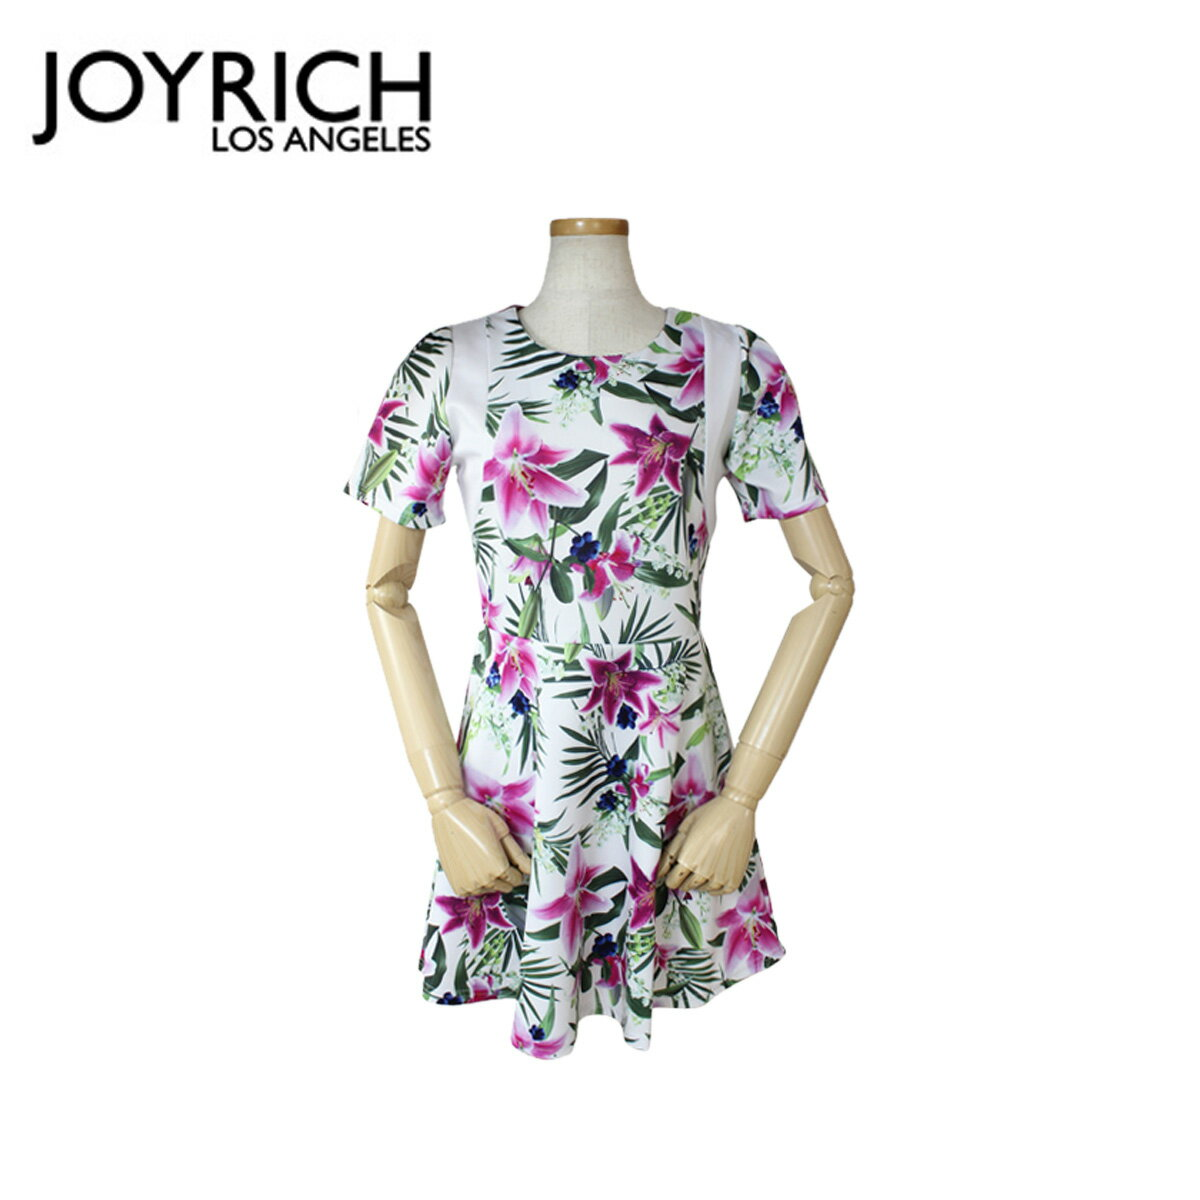 JOYRICH ジョイリッ� ワンピース ドレス  フレア 花柄 ホワイト OPTICAL GARDEN PLAYER DRESS  レディース